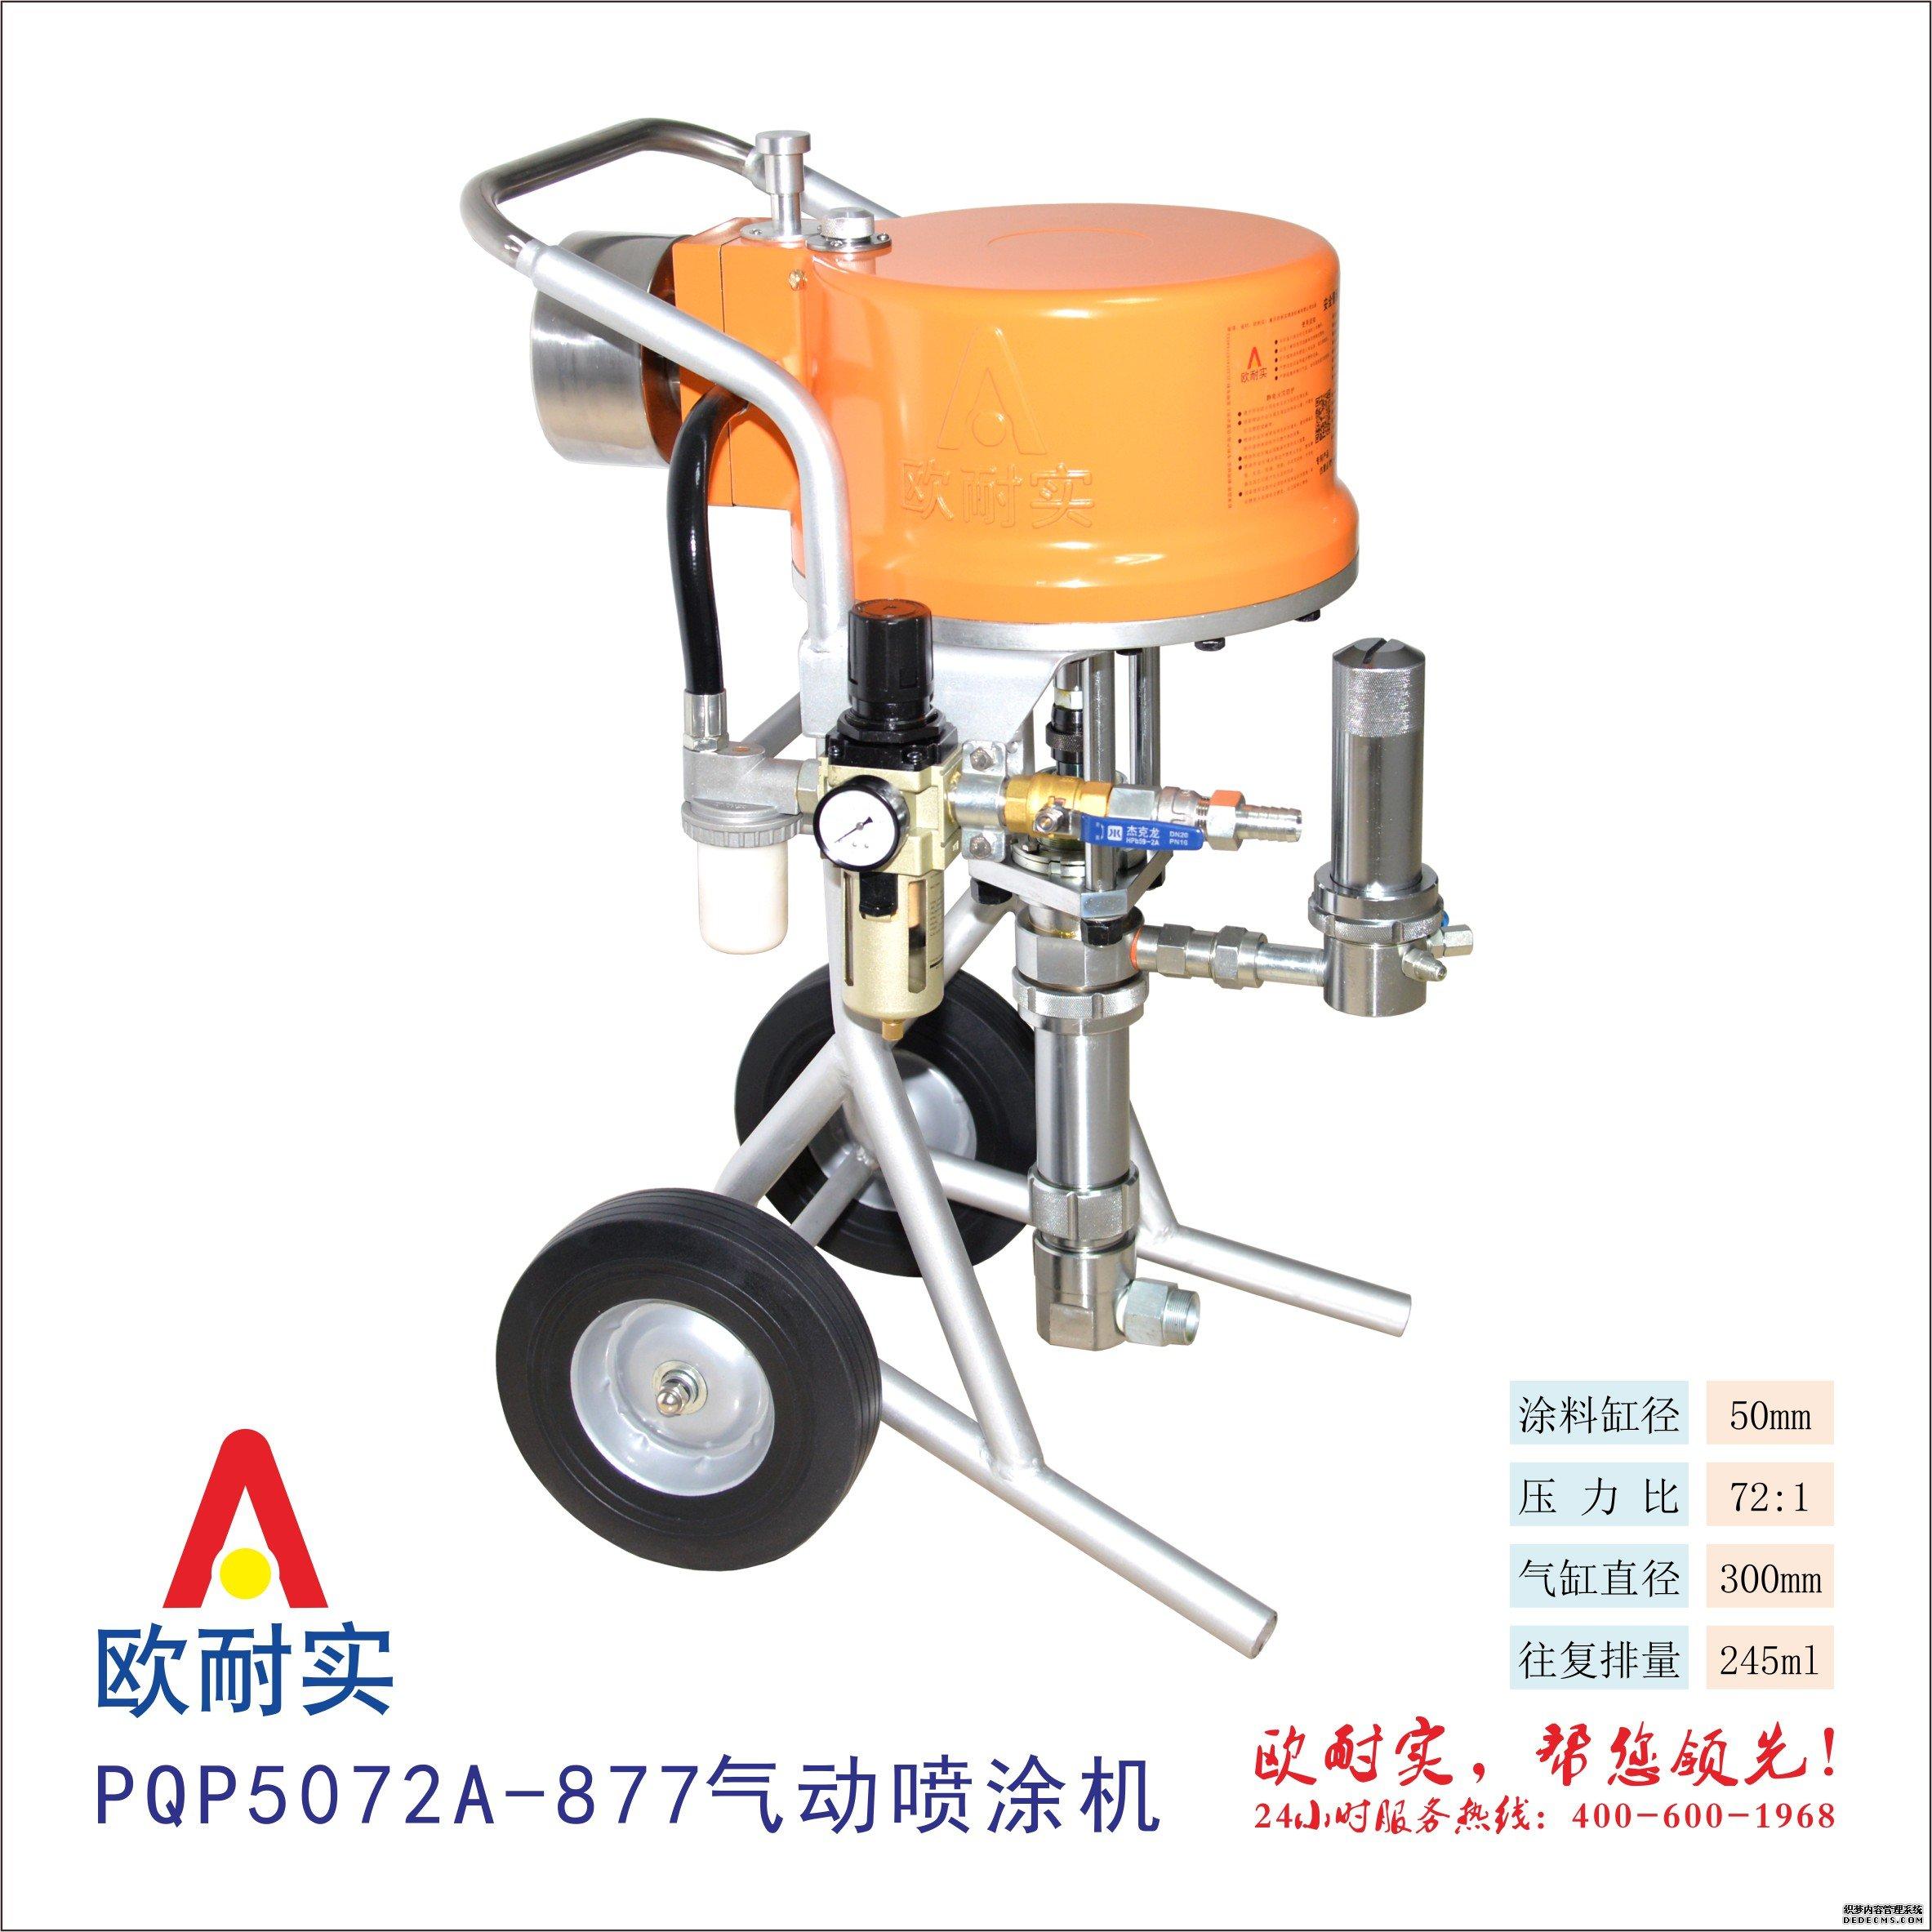 PQP5072A-877qi动pentu机